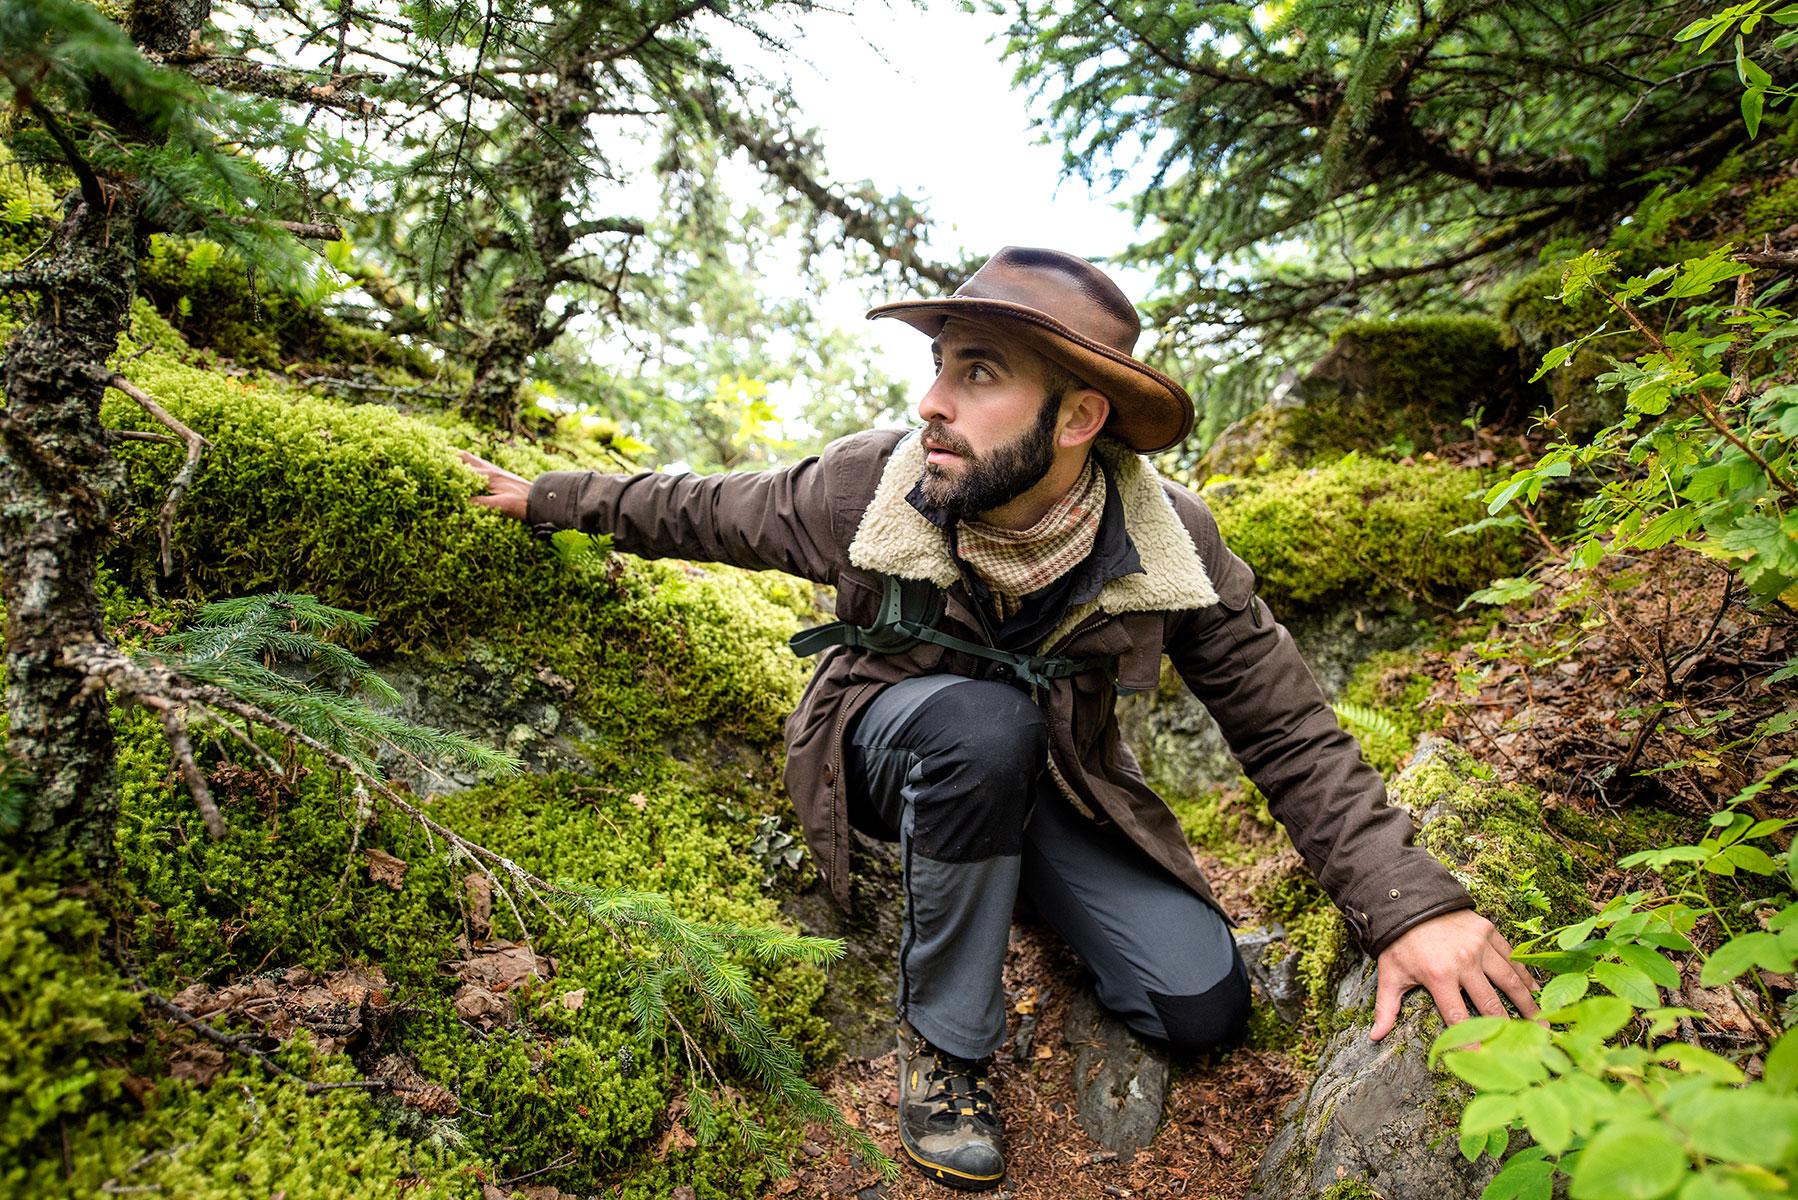 austin-trigg-brave-wilderness-alaska-BW-Coyote-Scopes-Chilkat-Park.jpg